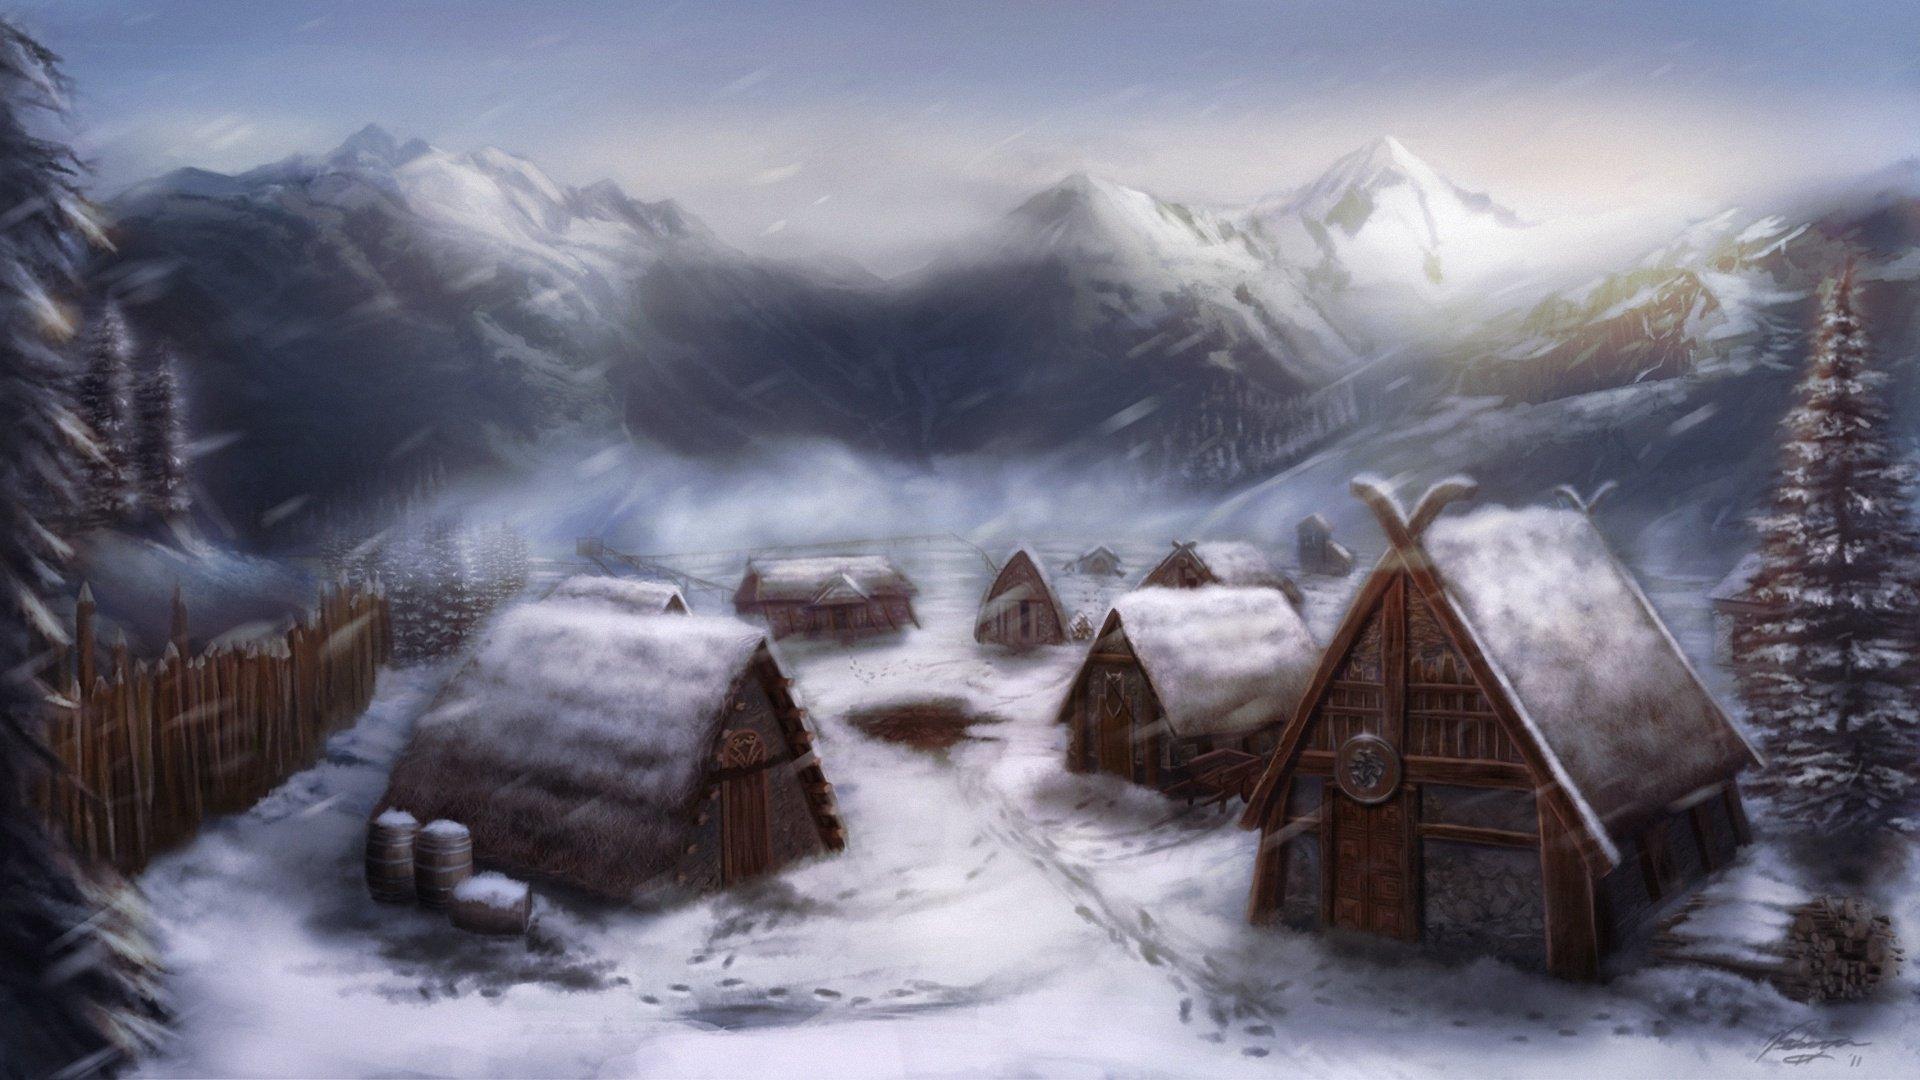 Snow Village Settlement The Vikings At Home Art Michael Davini Wallpaper 1920x1080 1009570 Wallpaperup